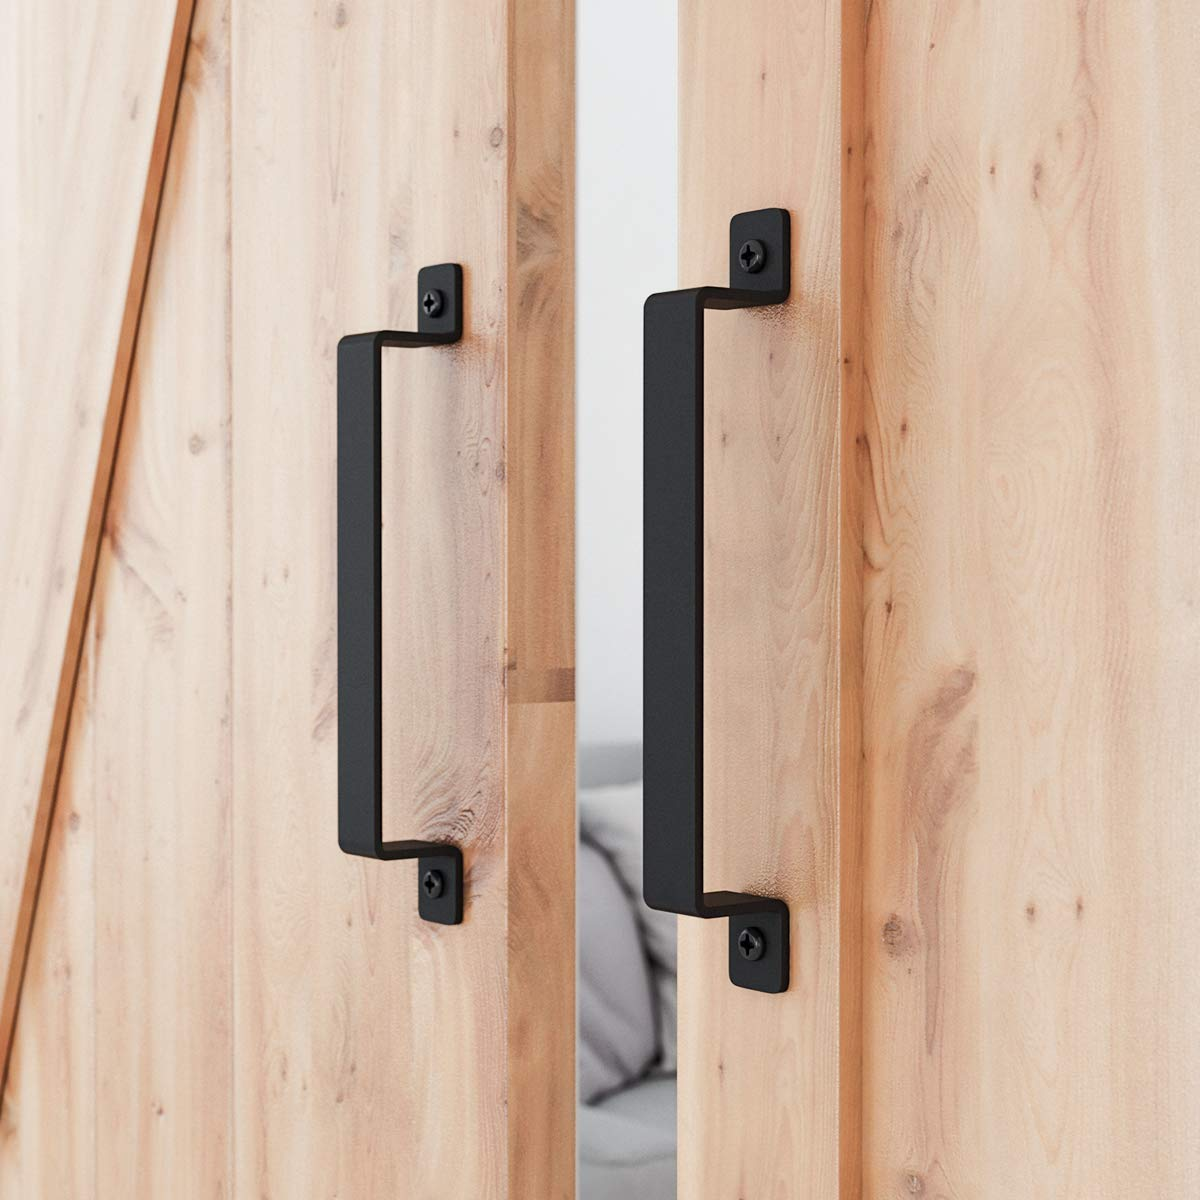 "SMARTSTANDARD 12"" Heavy Duty Barn Door Long Pull Handle for Gate Kitchen Furniture Cabinet Closet Drawer (2 PCS)"